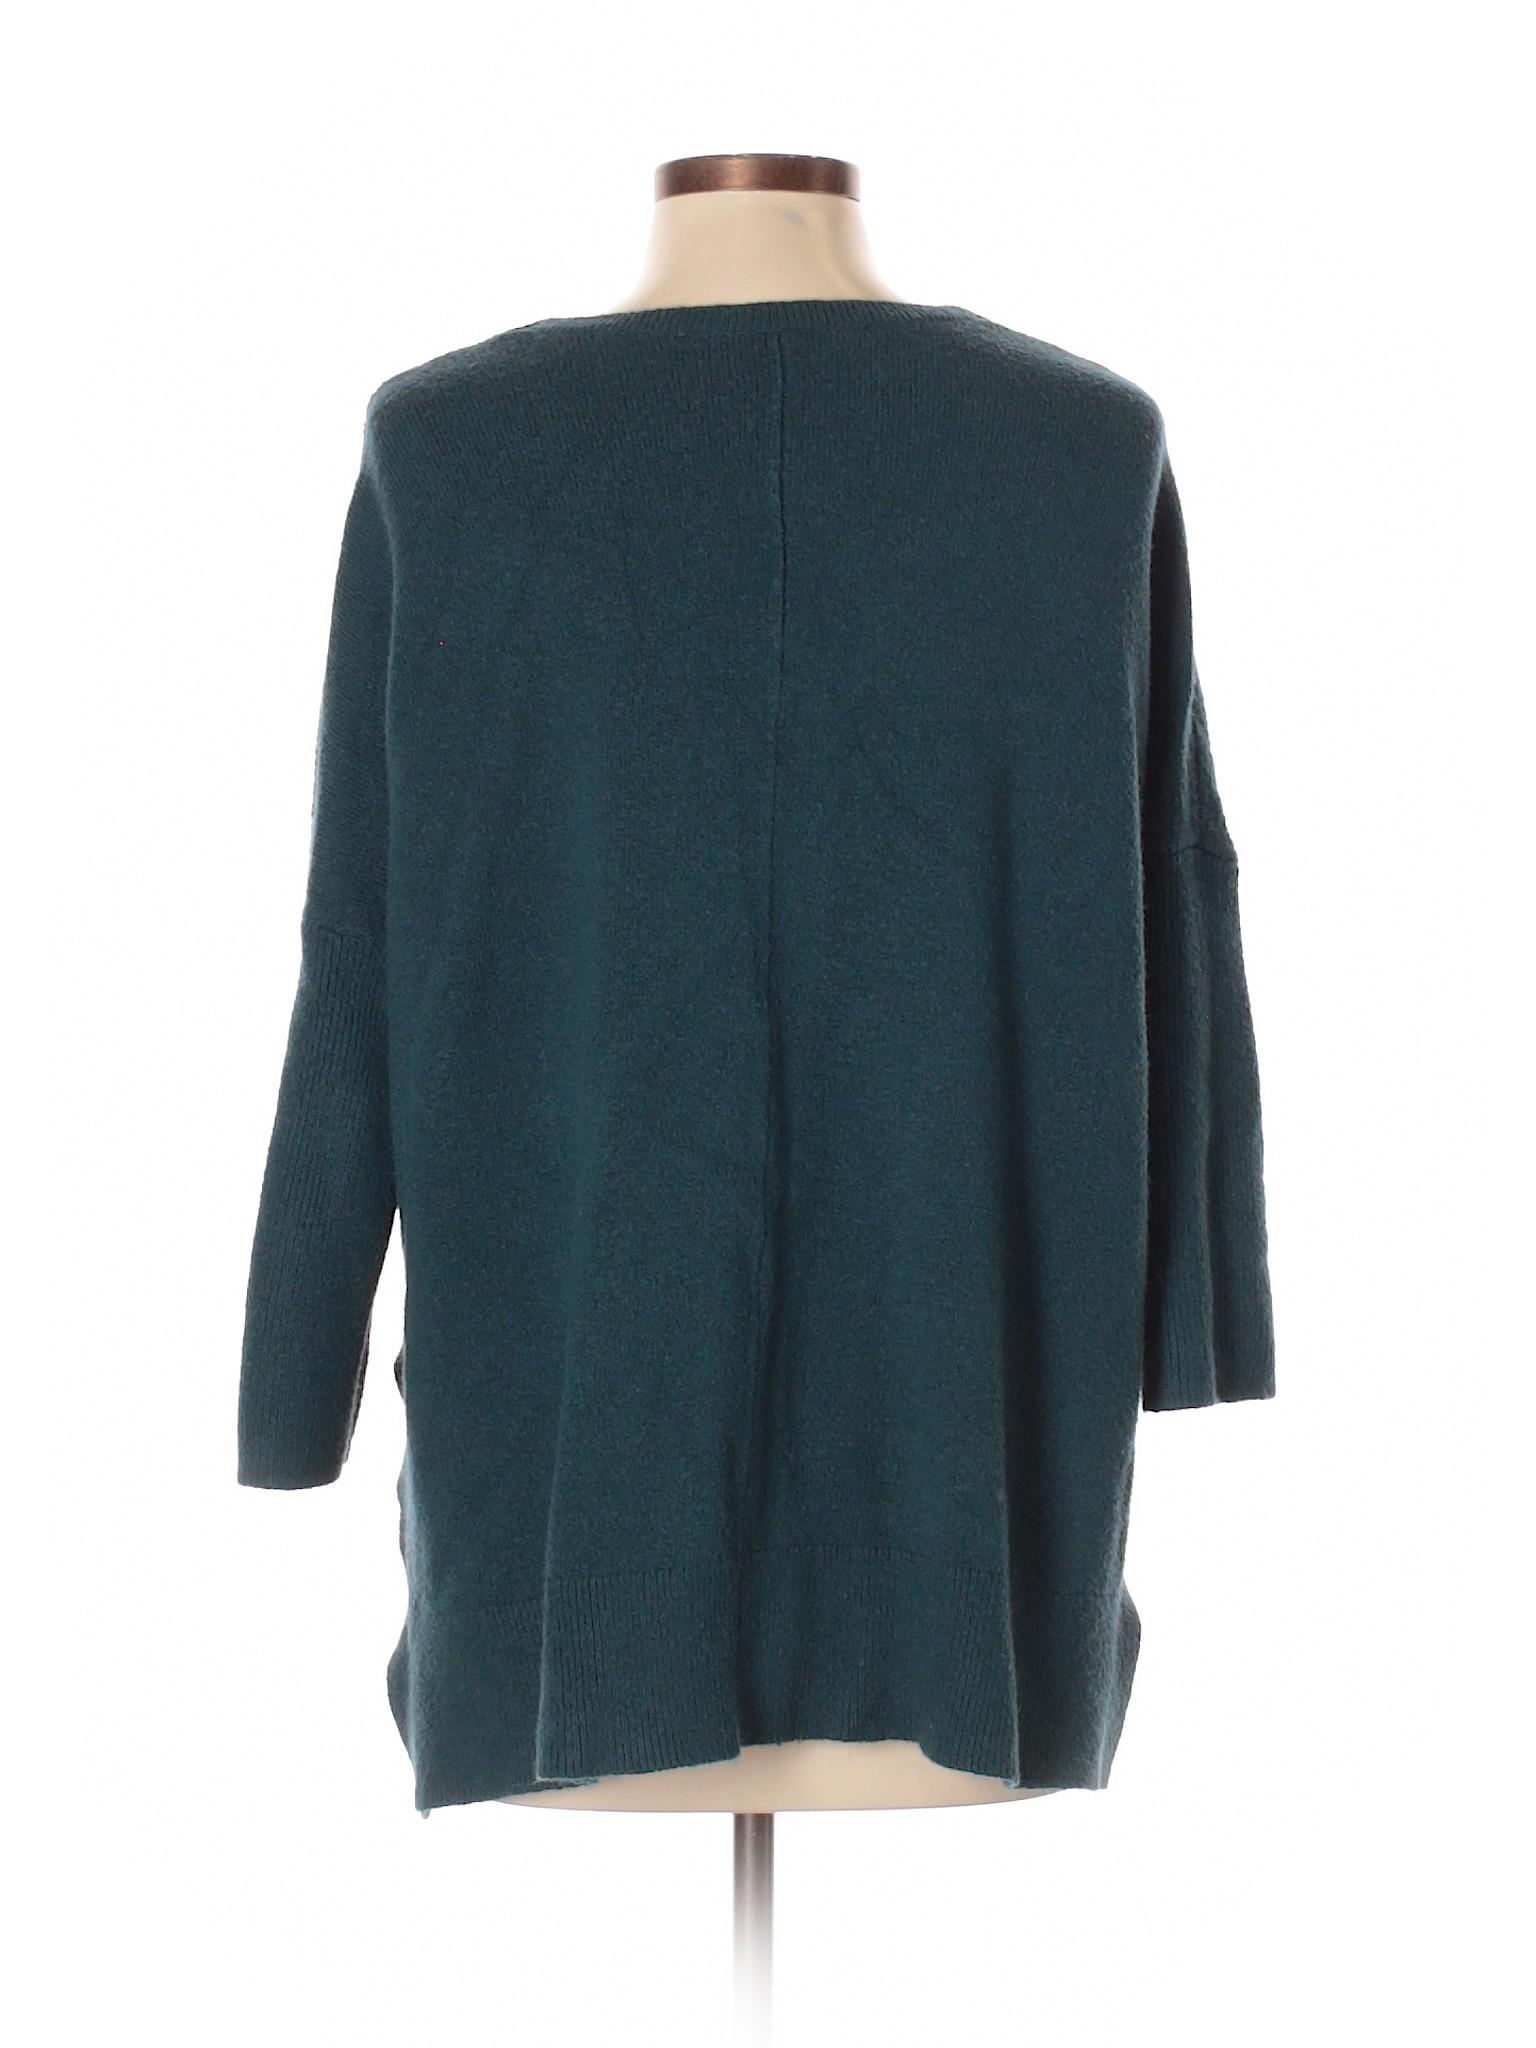 Taylor Boutique Ann Sweater LOFT Pullover Sxw1Bq4